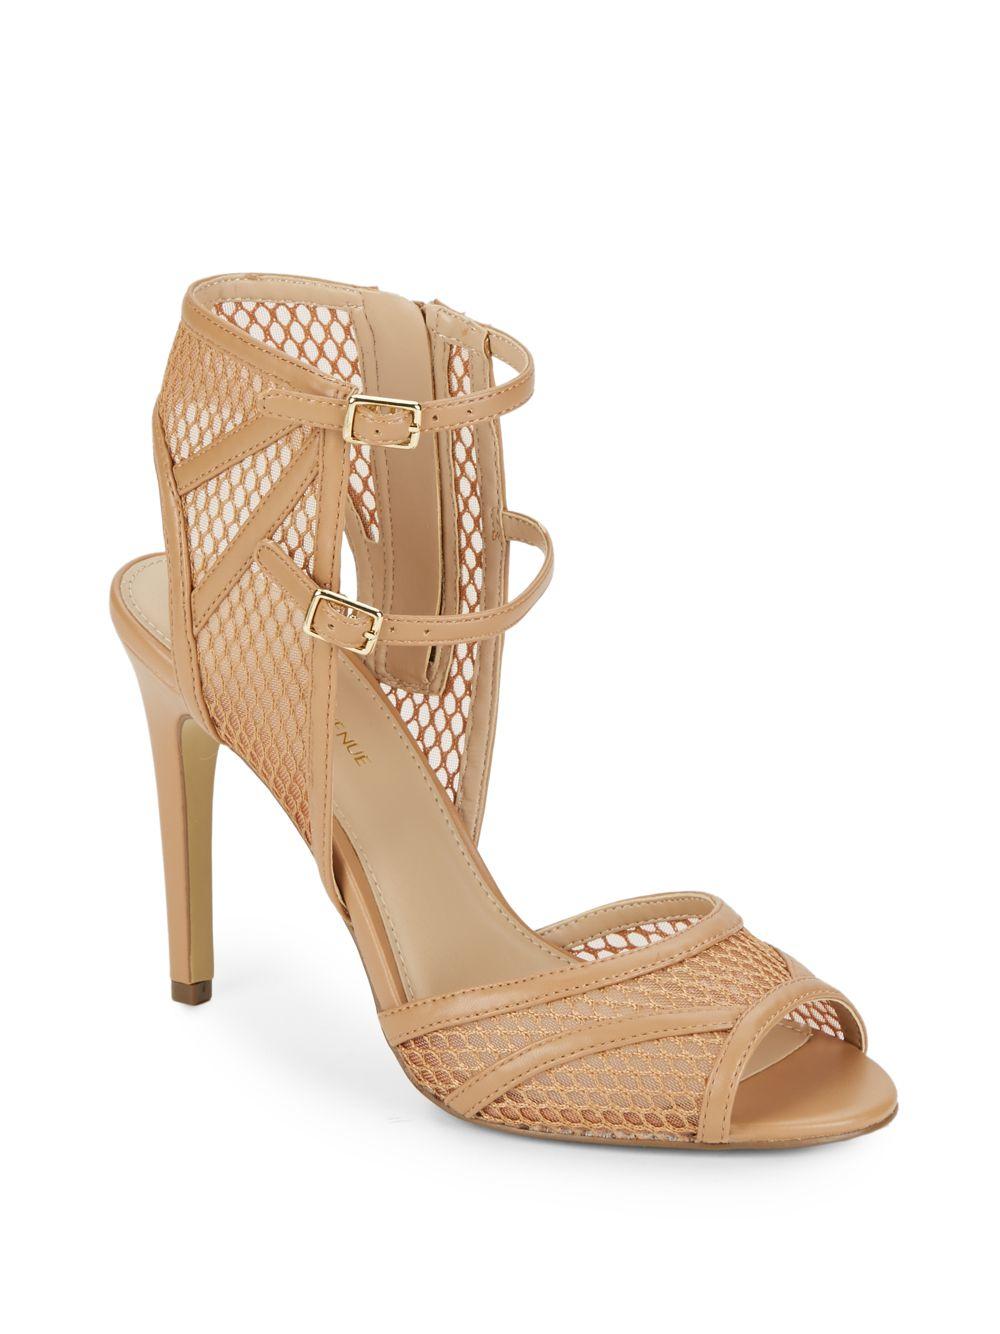 Lee S Fifth Avenue Shoes